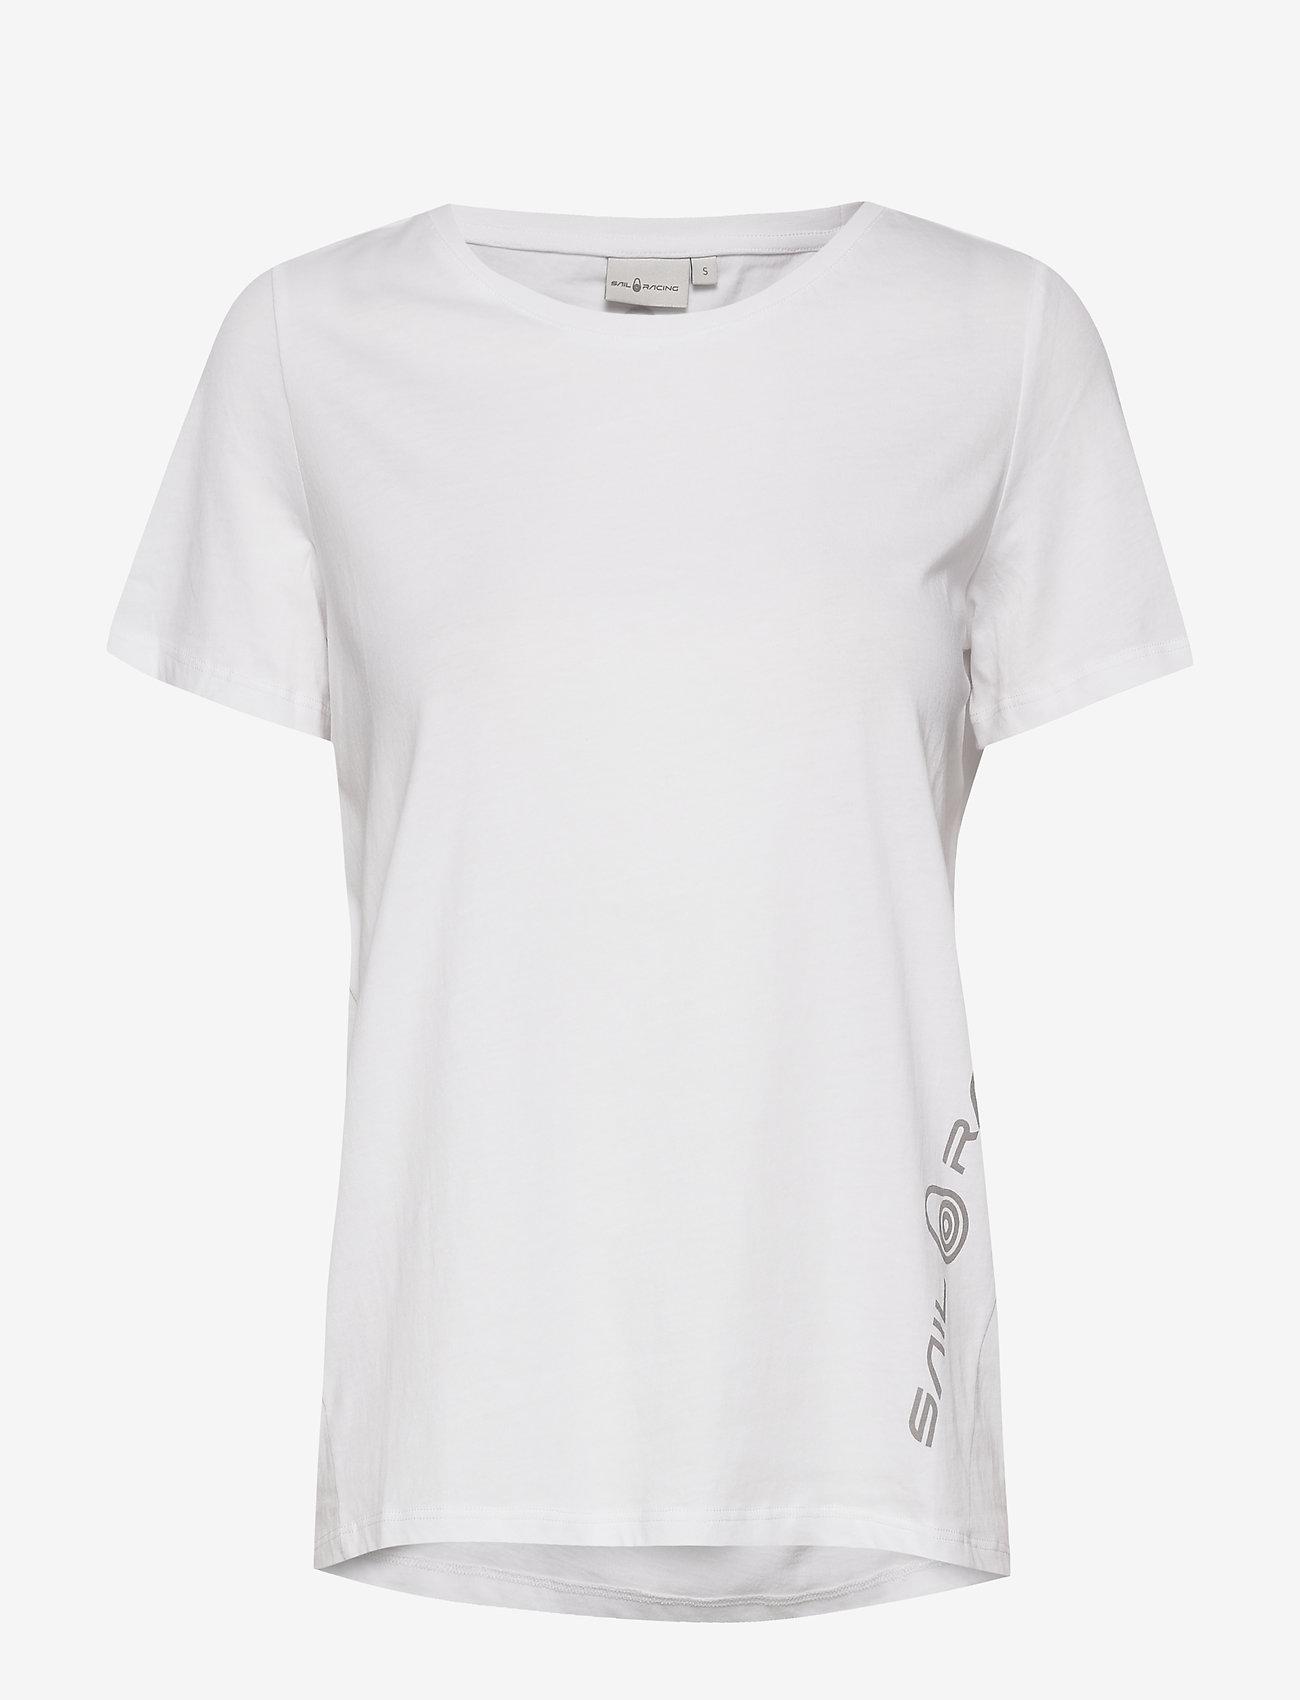 Sail Racing - W GAIL TEE#2 - t-shirts - white - 0